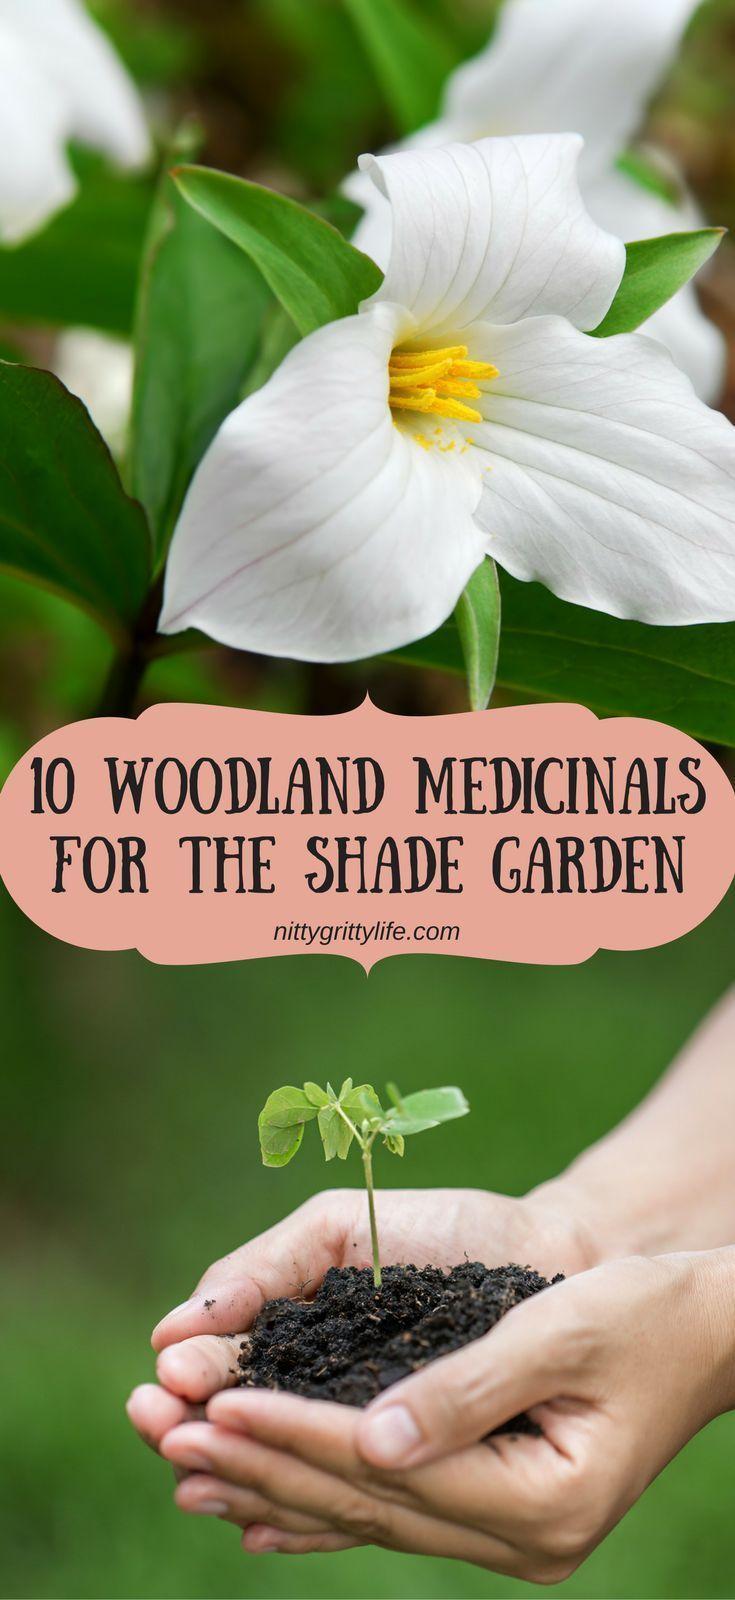 Holistic Landscaping: 10 Woodland Medicinals for the Shade Garden-#Garden